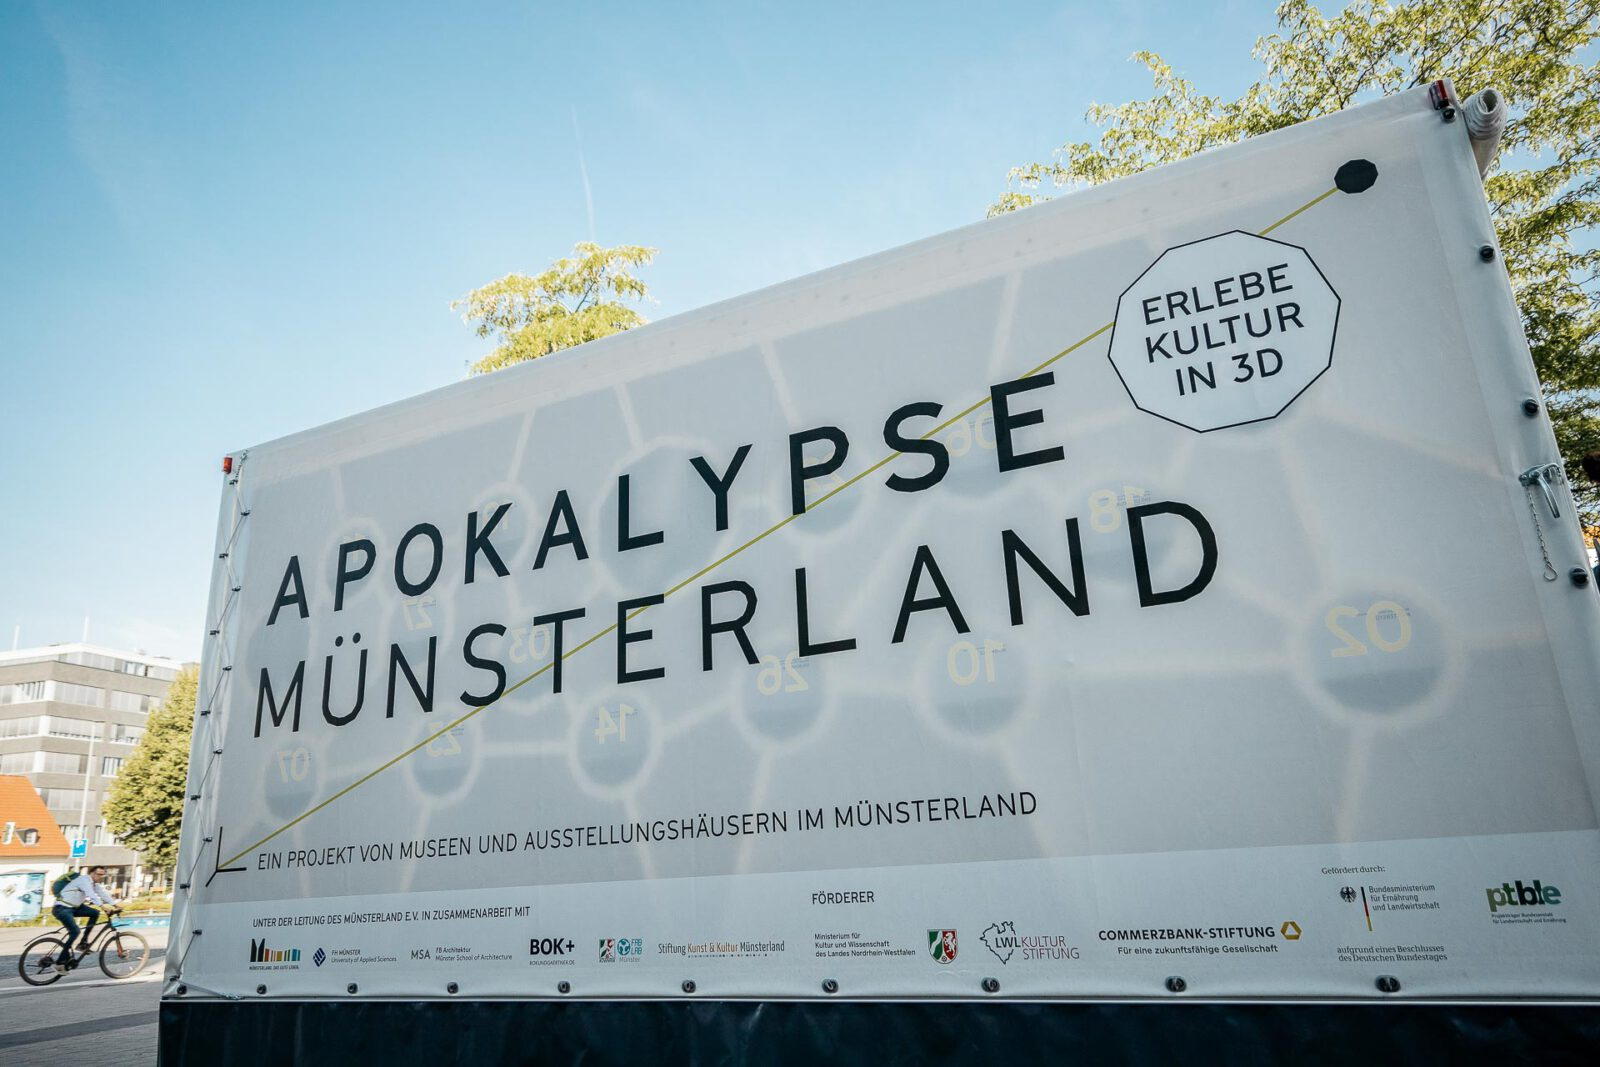 1_S_Apokalypse-Muensterland_23-08-2019_TE_9670